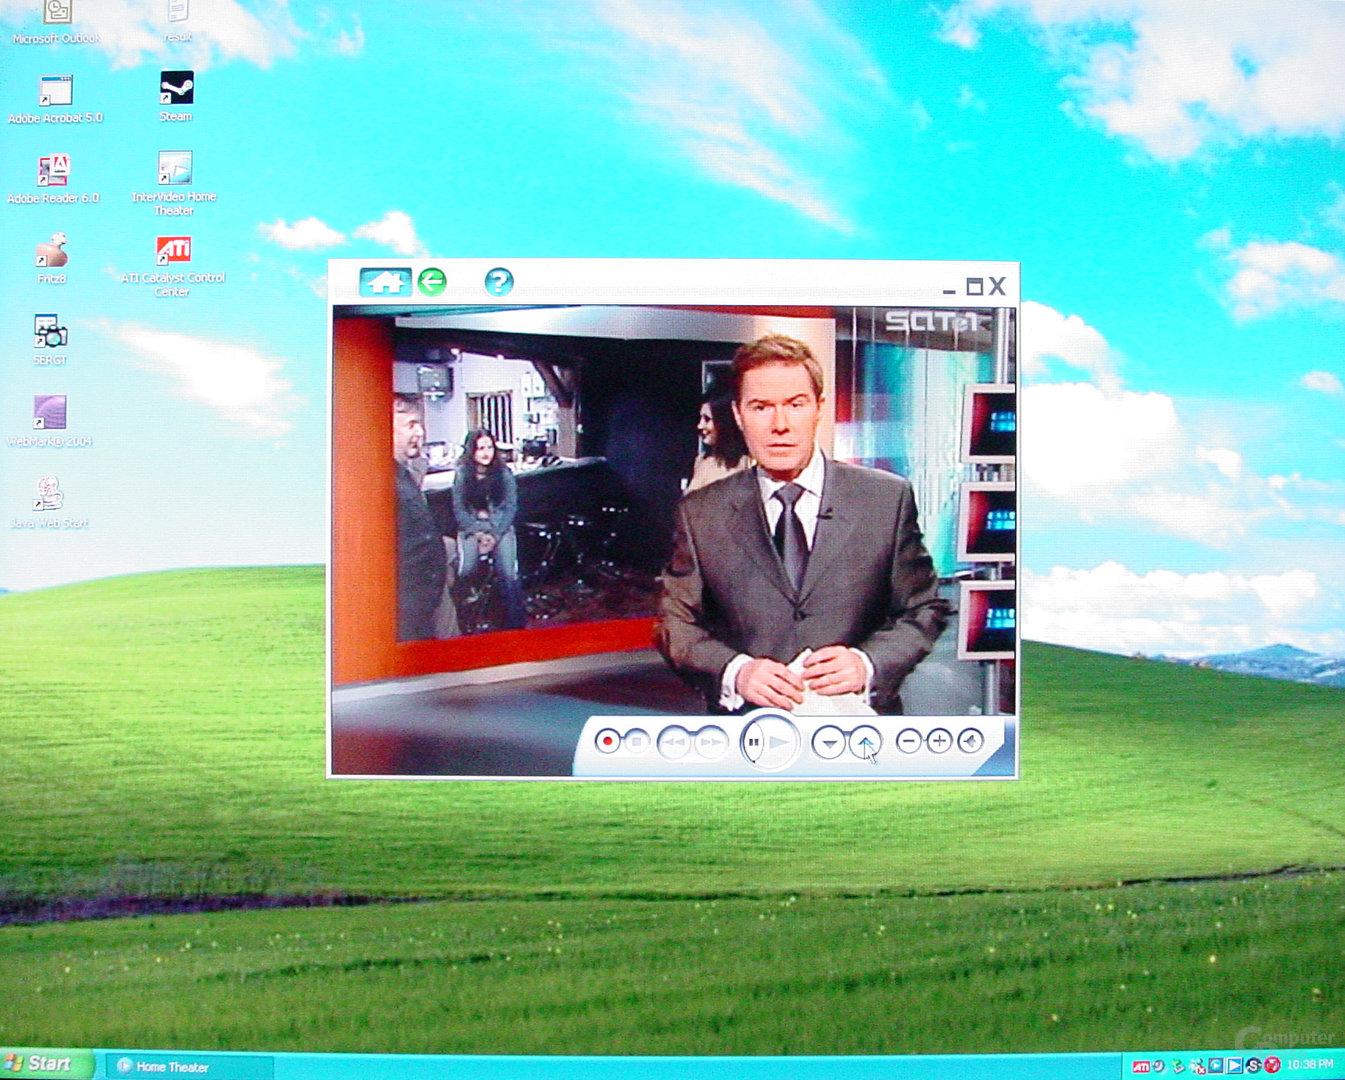 Asus S-presso S1-P111 Deluxe - Multimedia - Fernsehwiedergabe im Fenster - 2